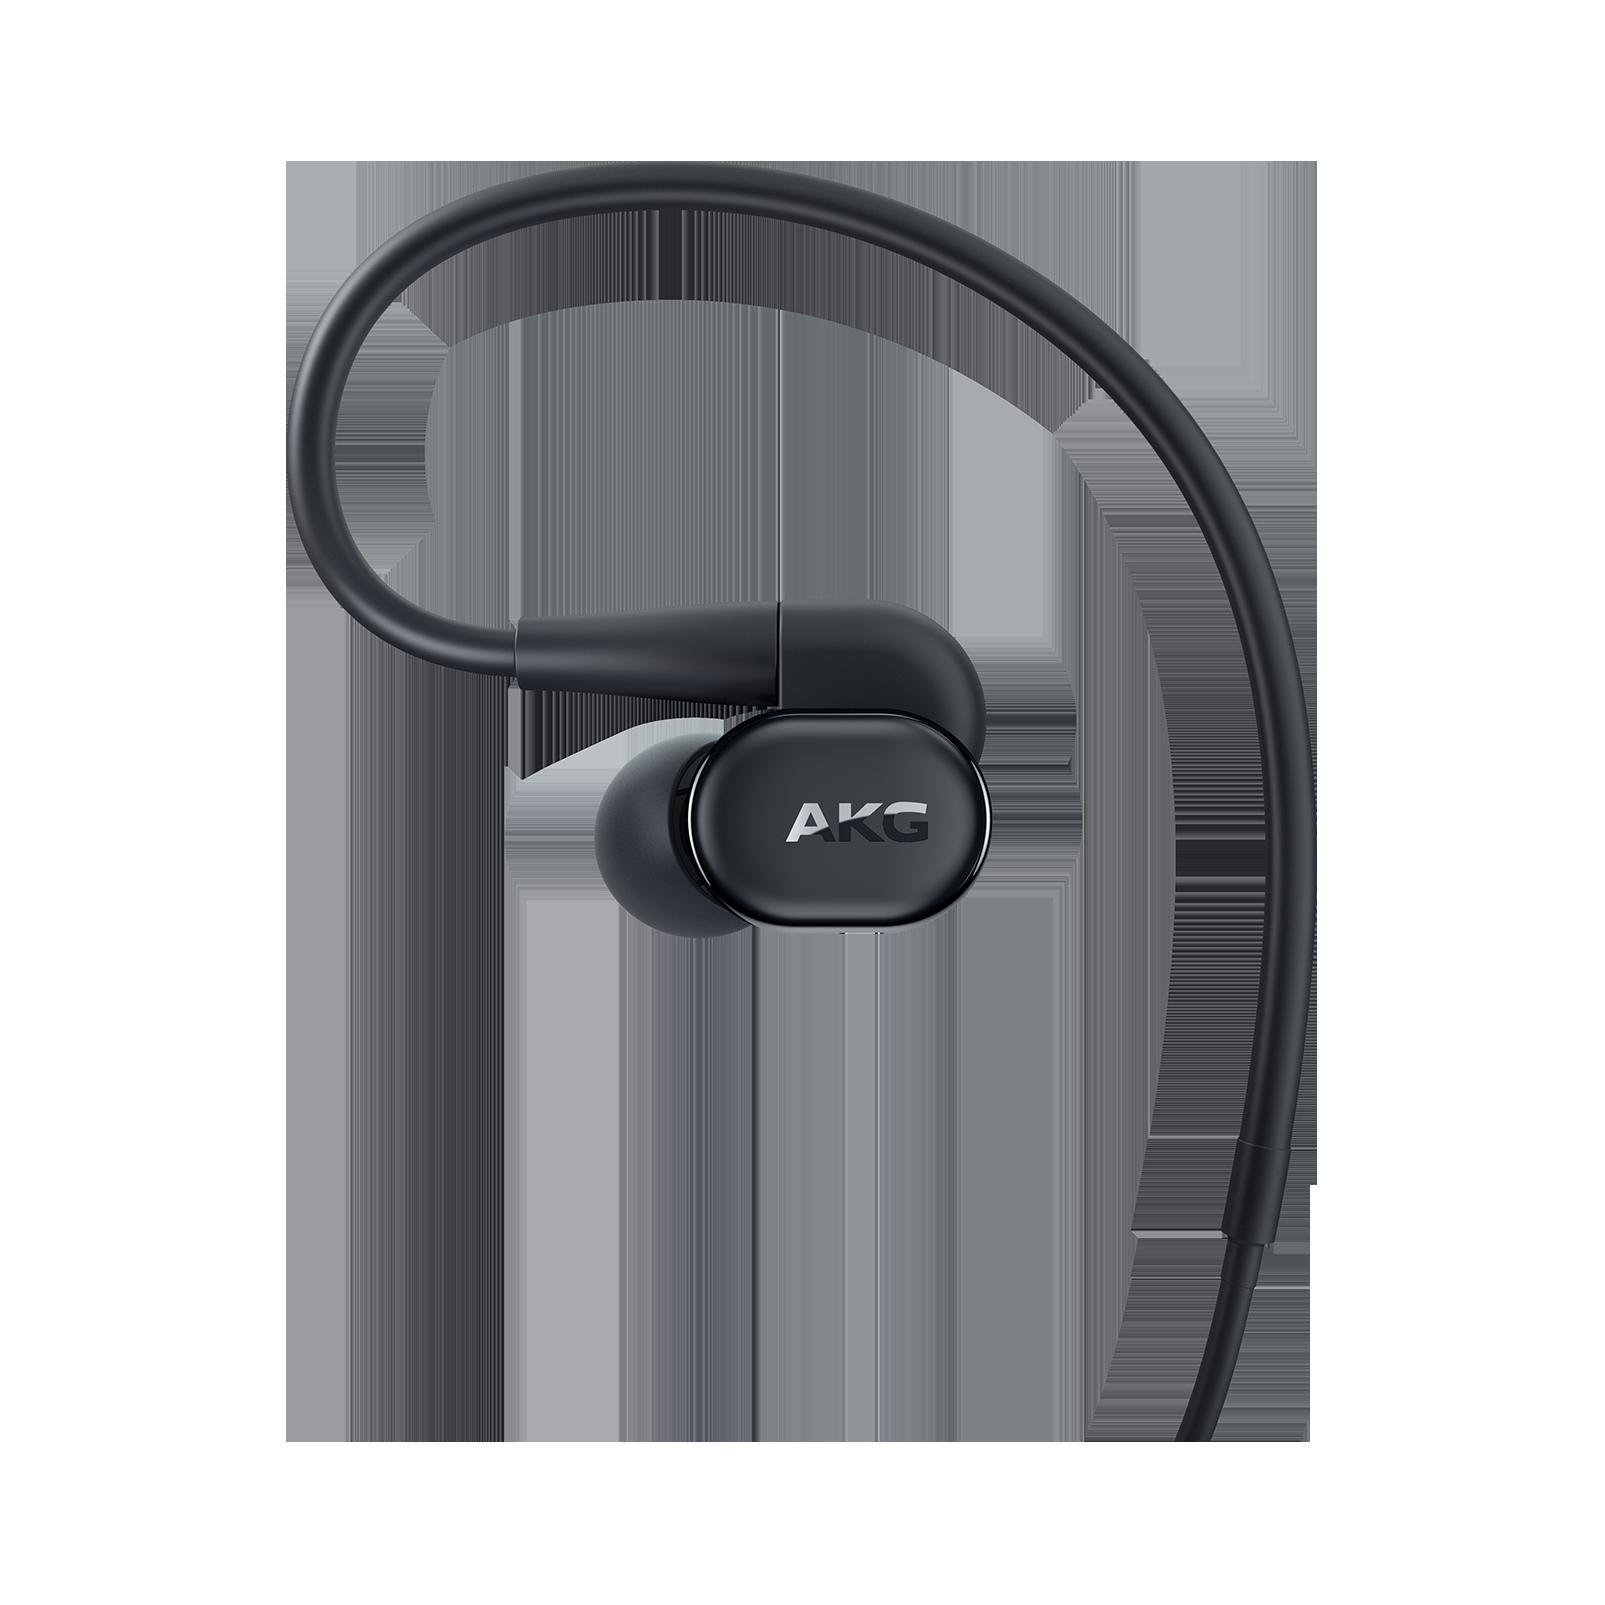 AKG N30 - Black - Hi-Res in-ear headphones with customizable sound - Left